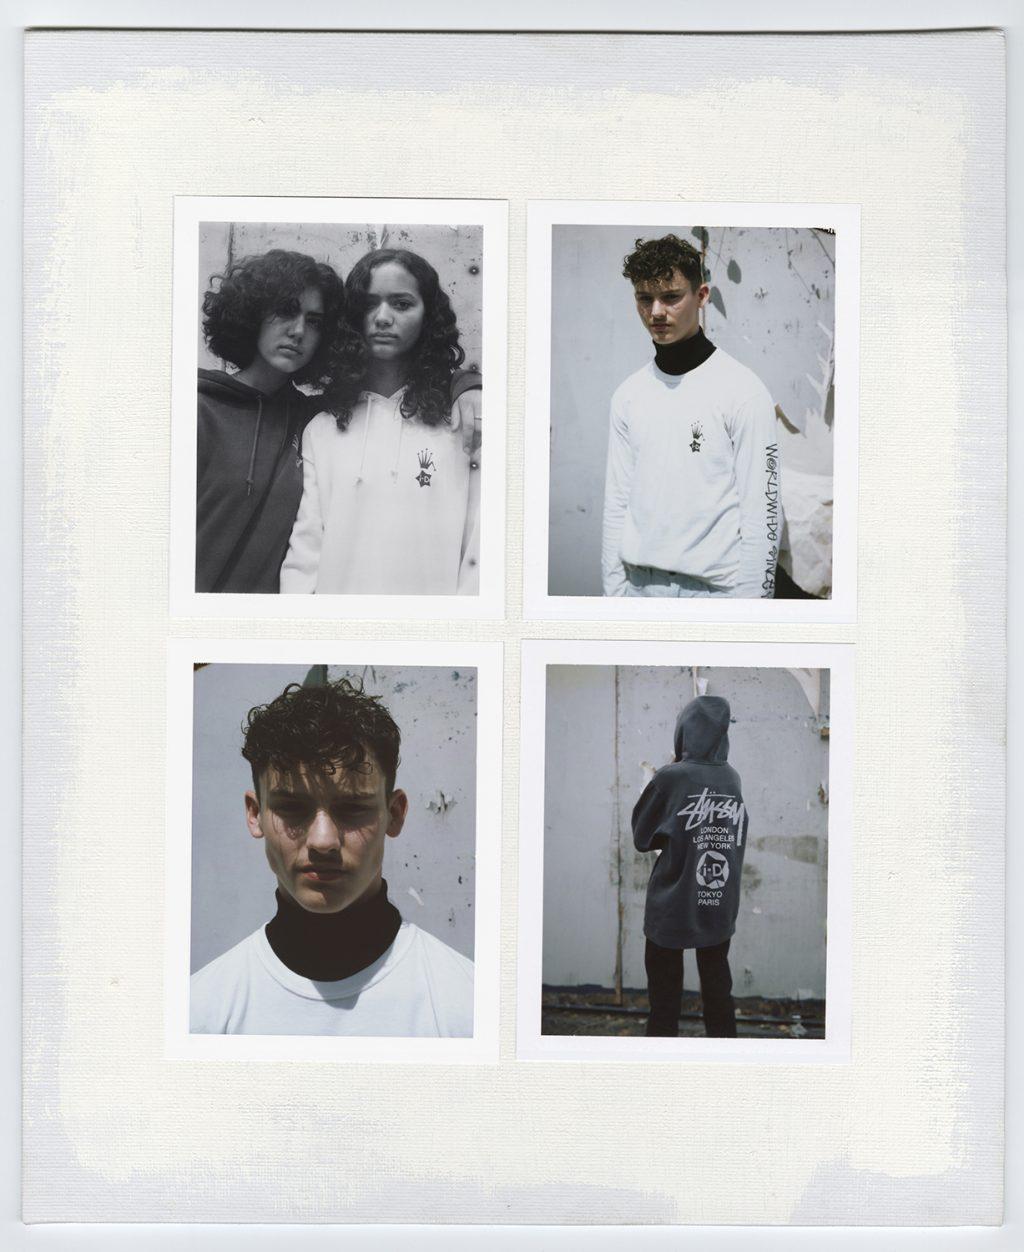 stussy-i-d-magazine-2018-collaboration-release-20180713